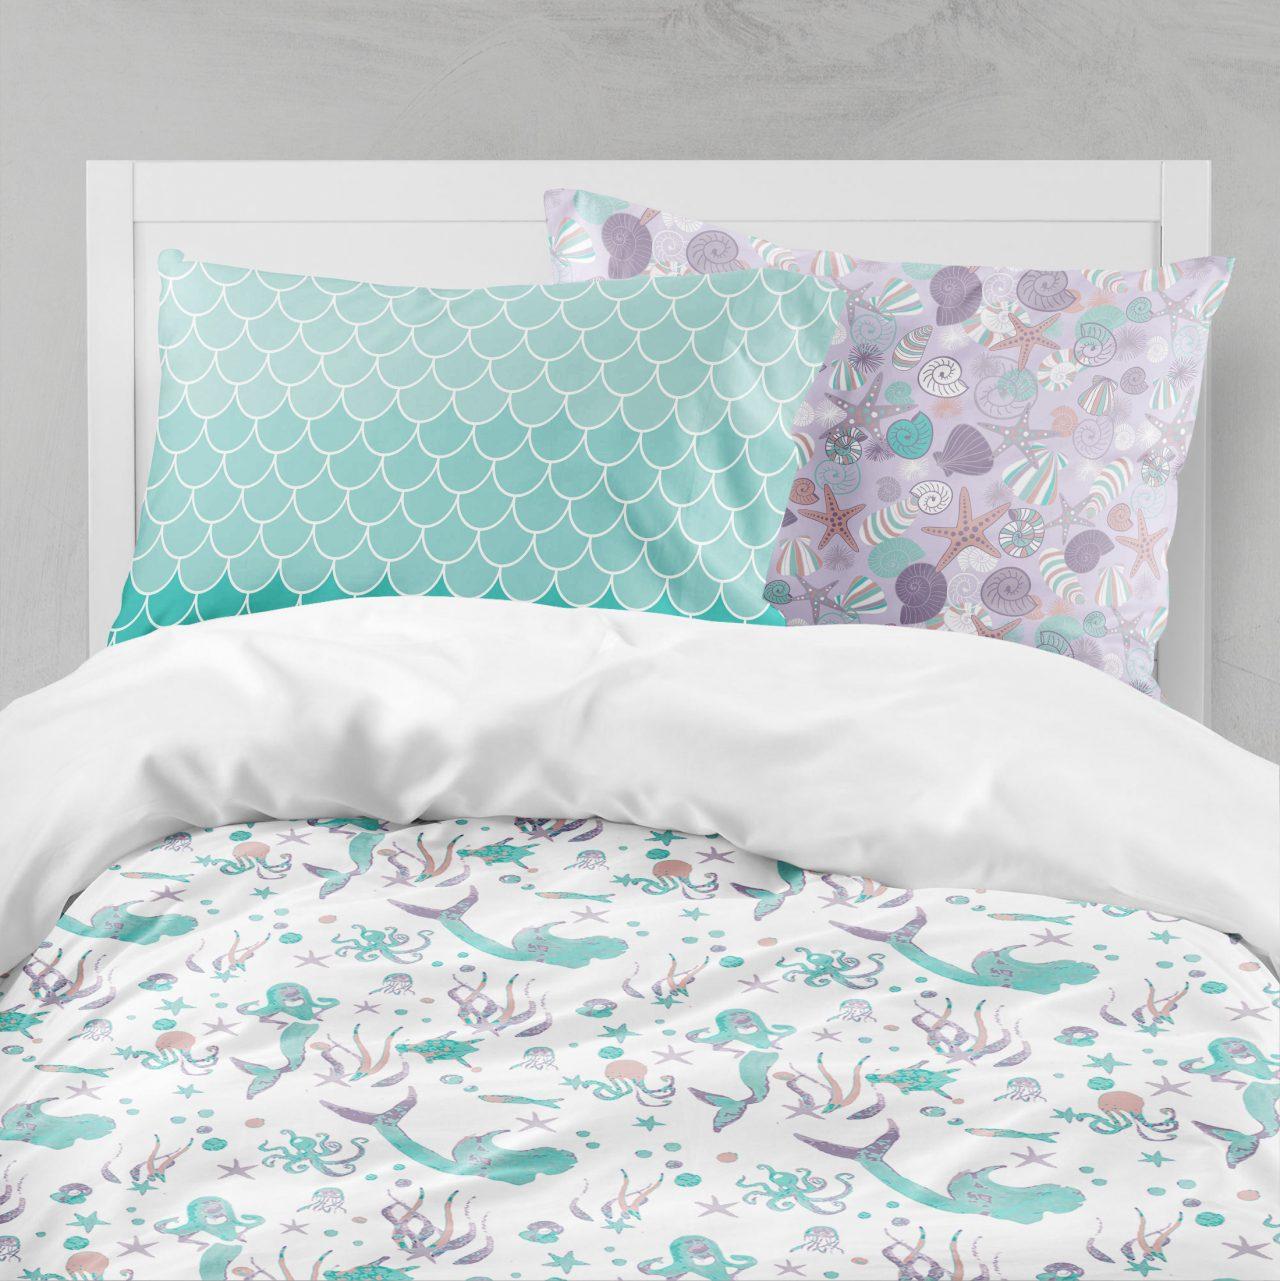 Mermaid Bedding Set